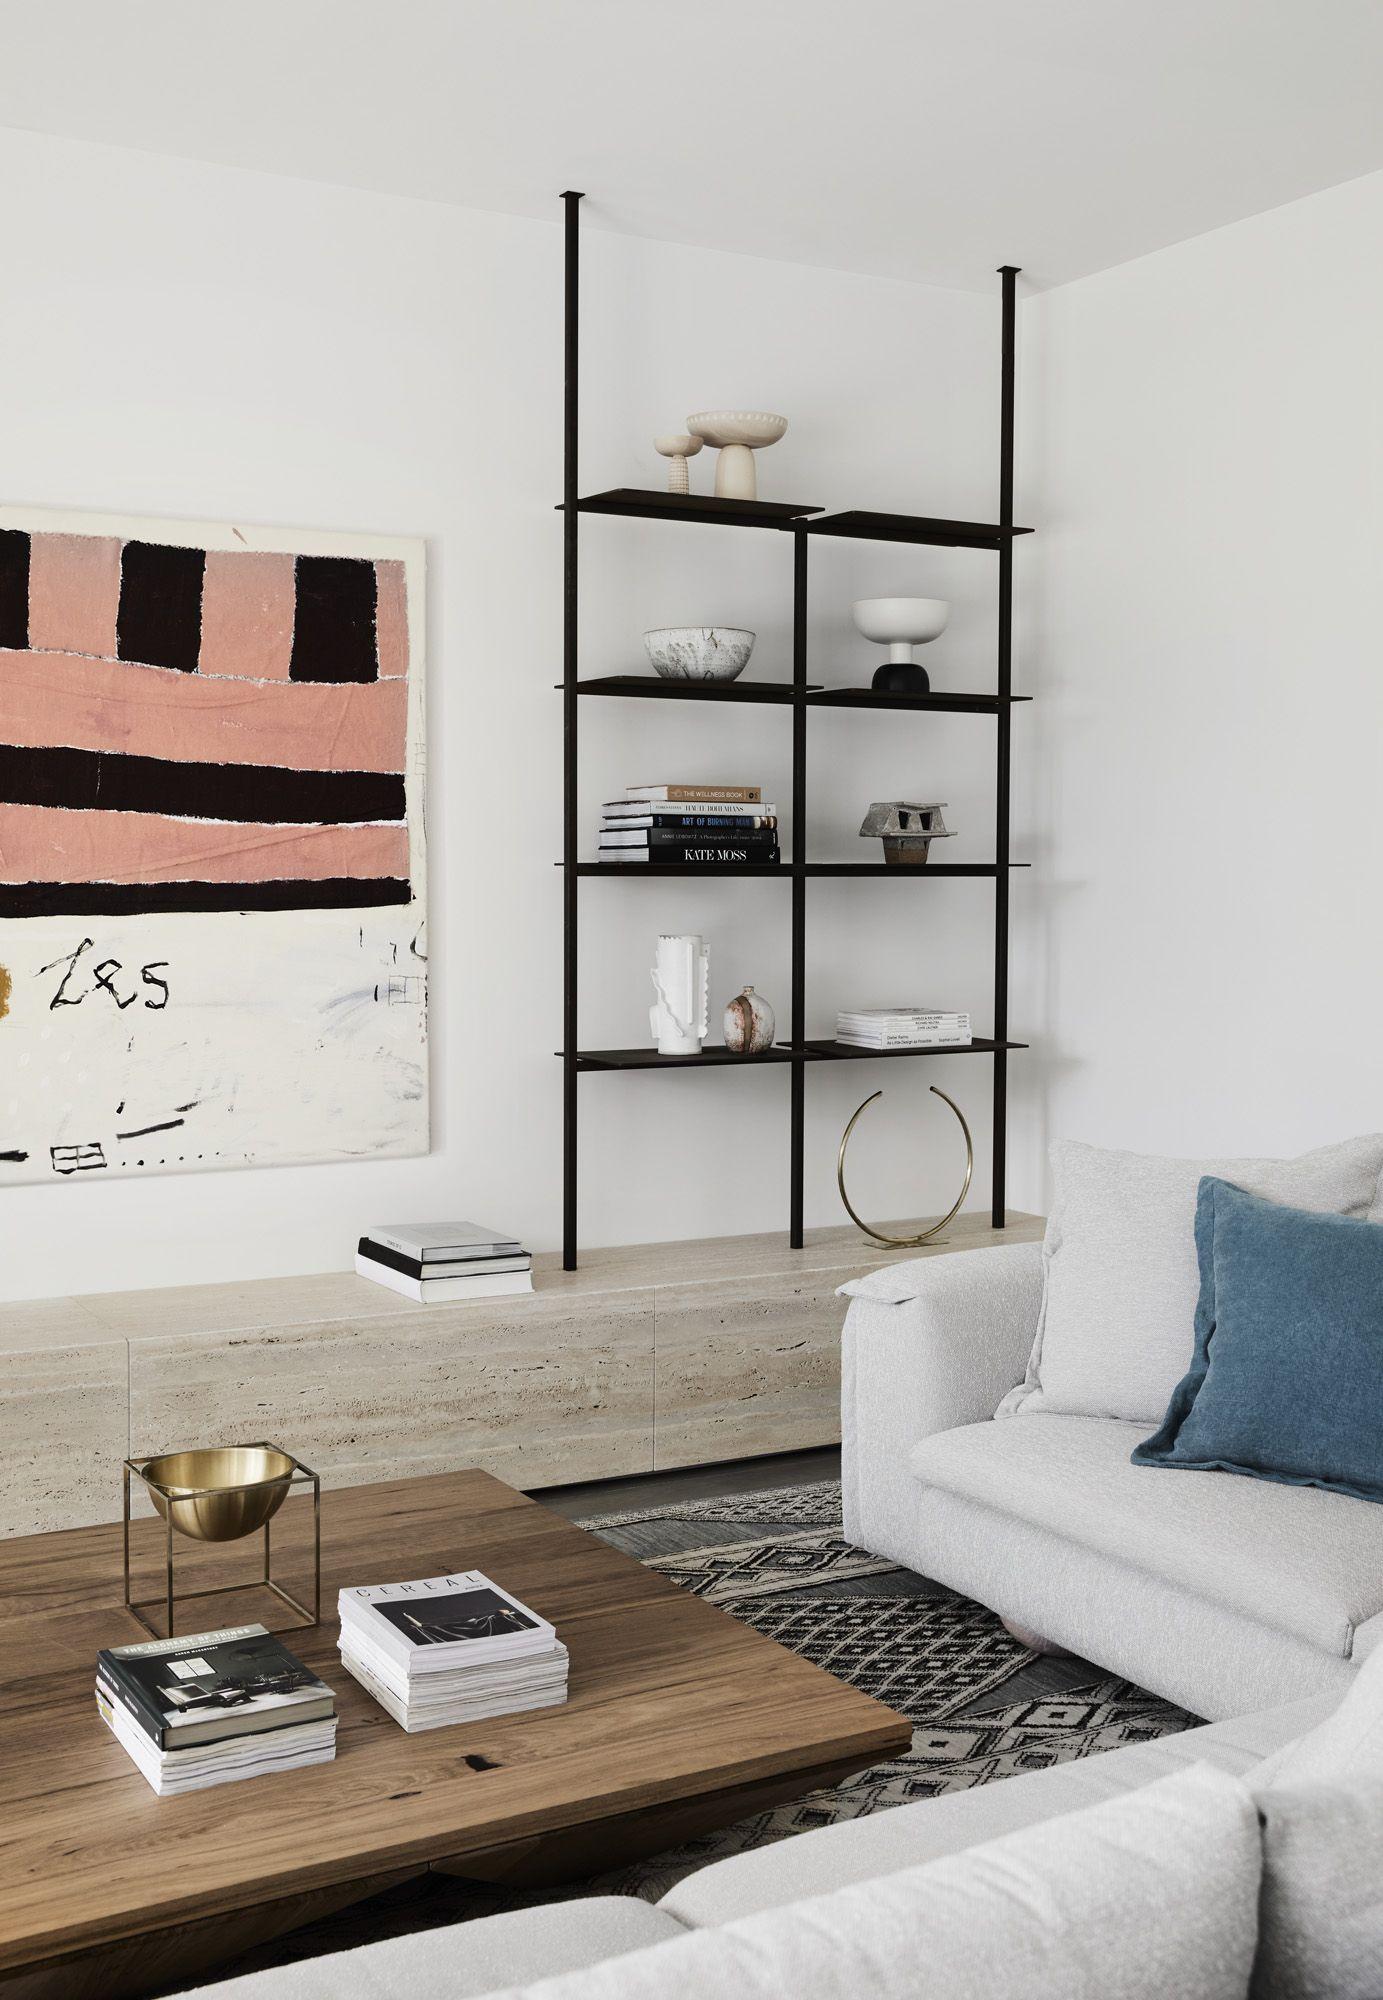 Wattle House | Interior design awards, Australian interior ...